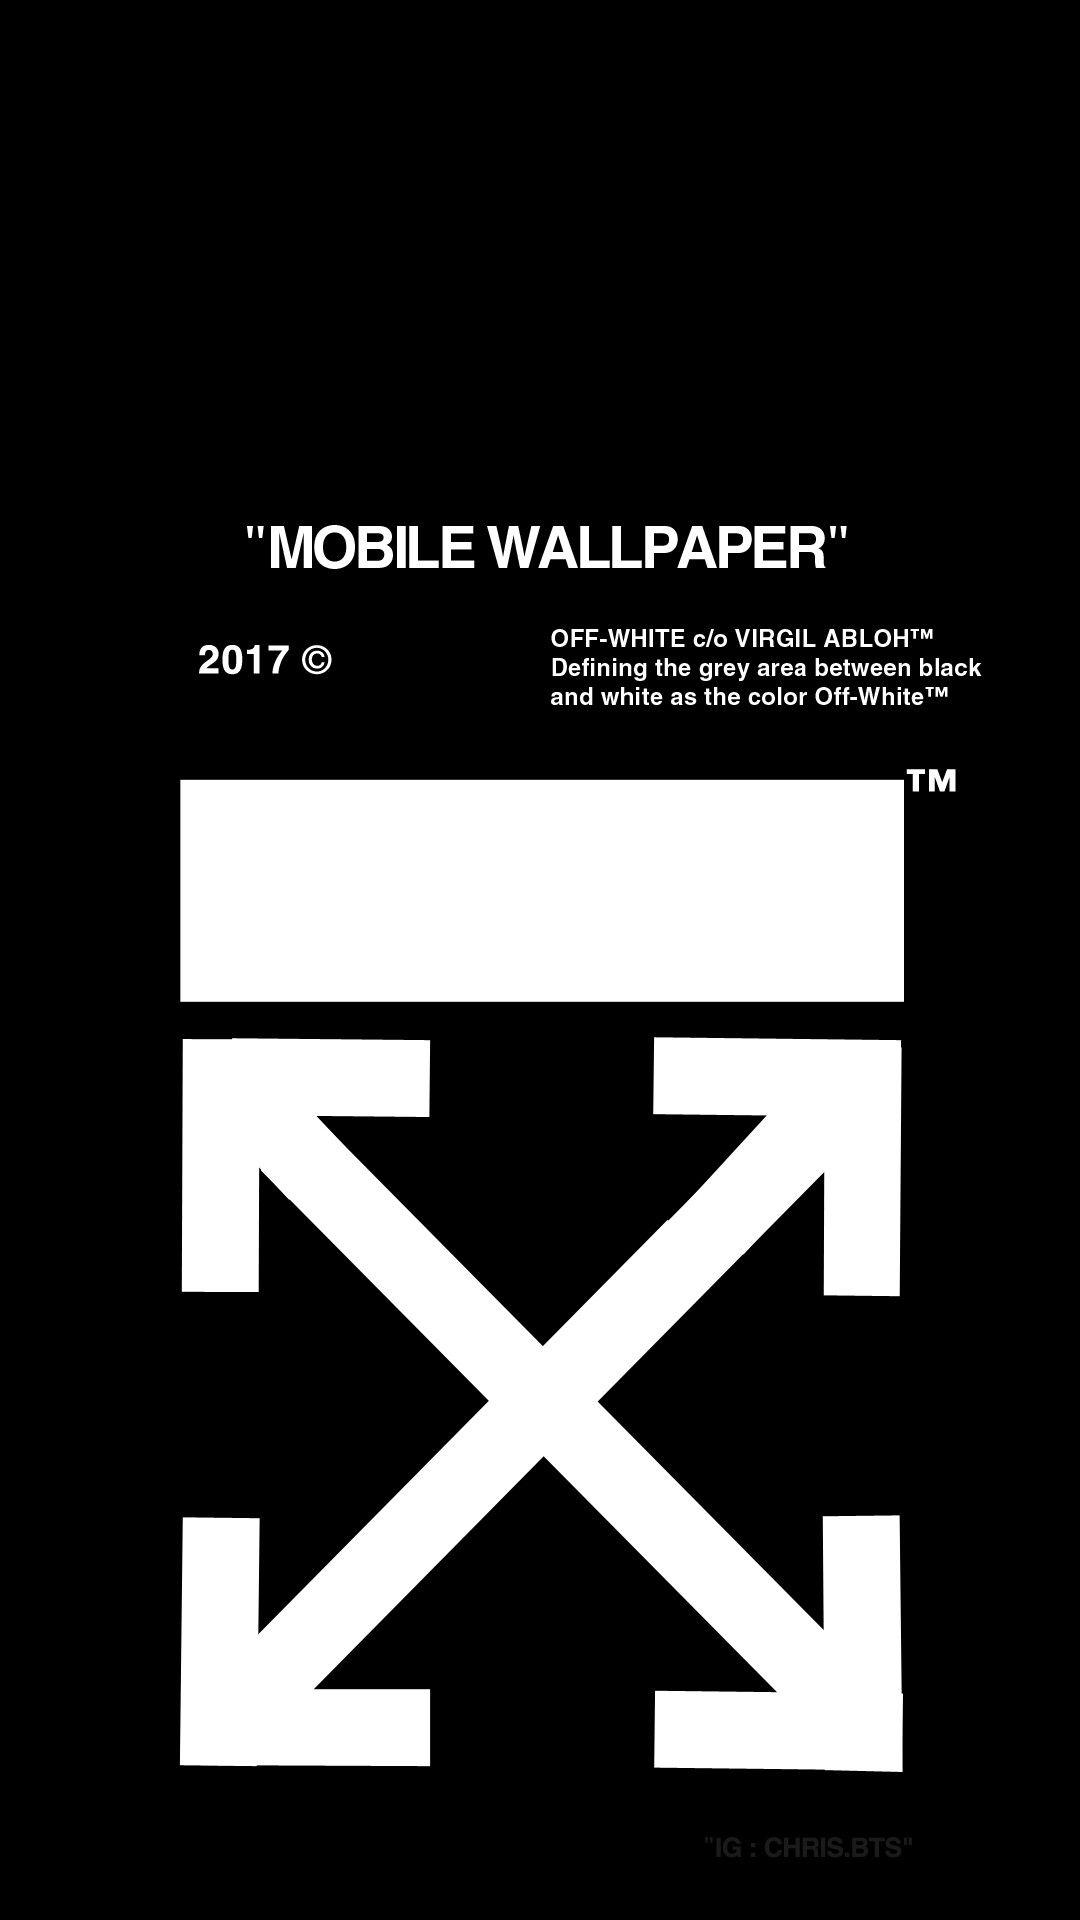 OFF-WHITE Black Wallpaper | OFF | Hypebeast wallpaper, Wallpaper off white, Bape wallpaper iphone